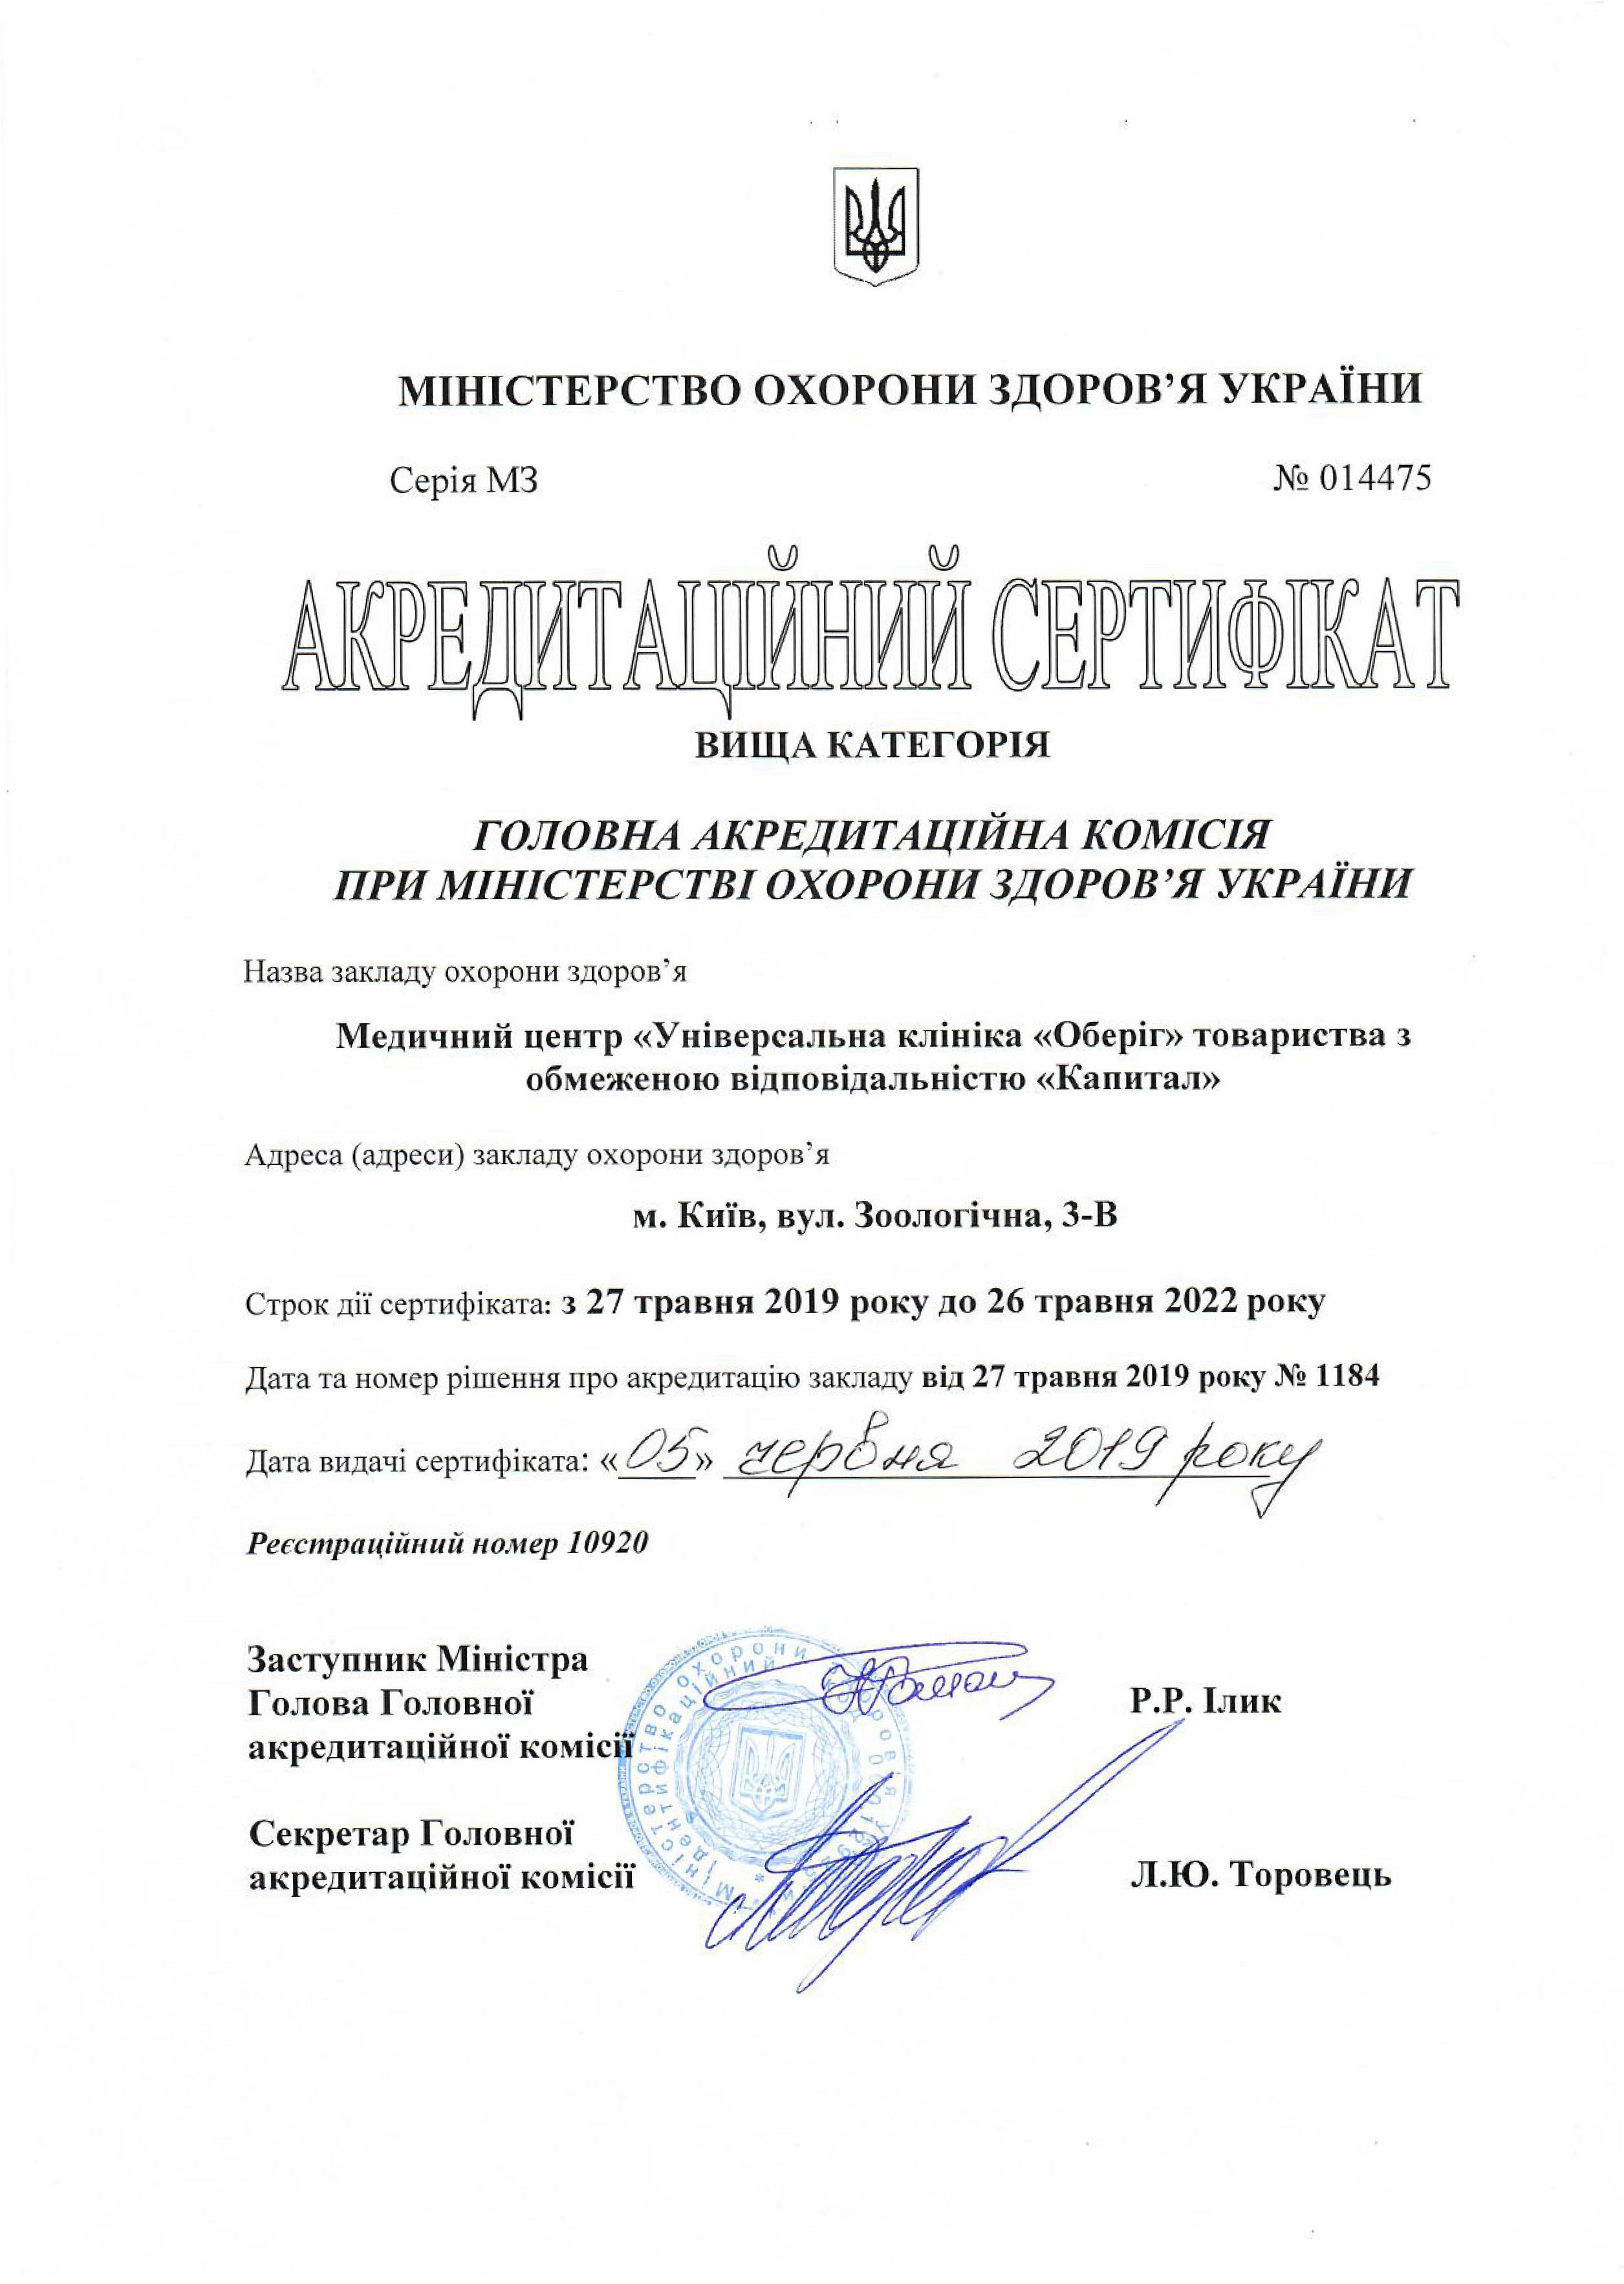 Oberig Clinic - Medical Center in Kiev - Disease treatment